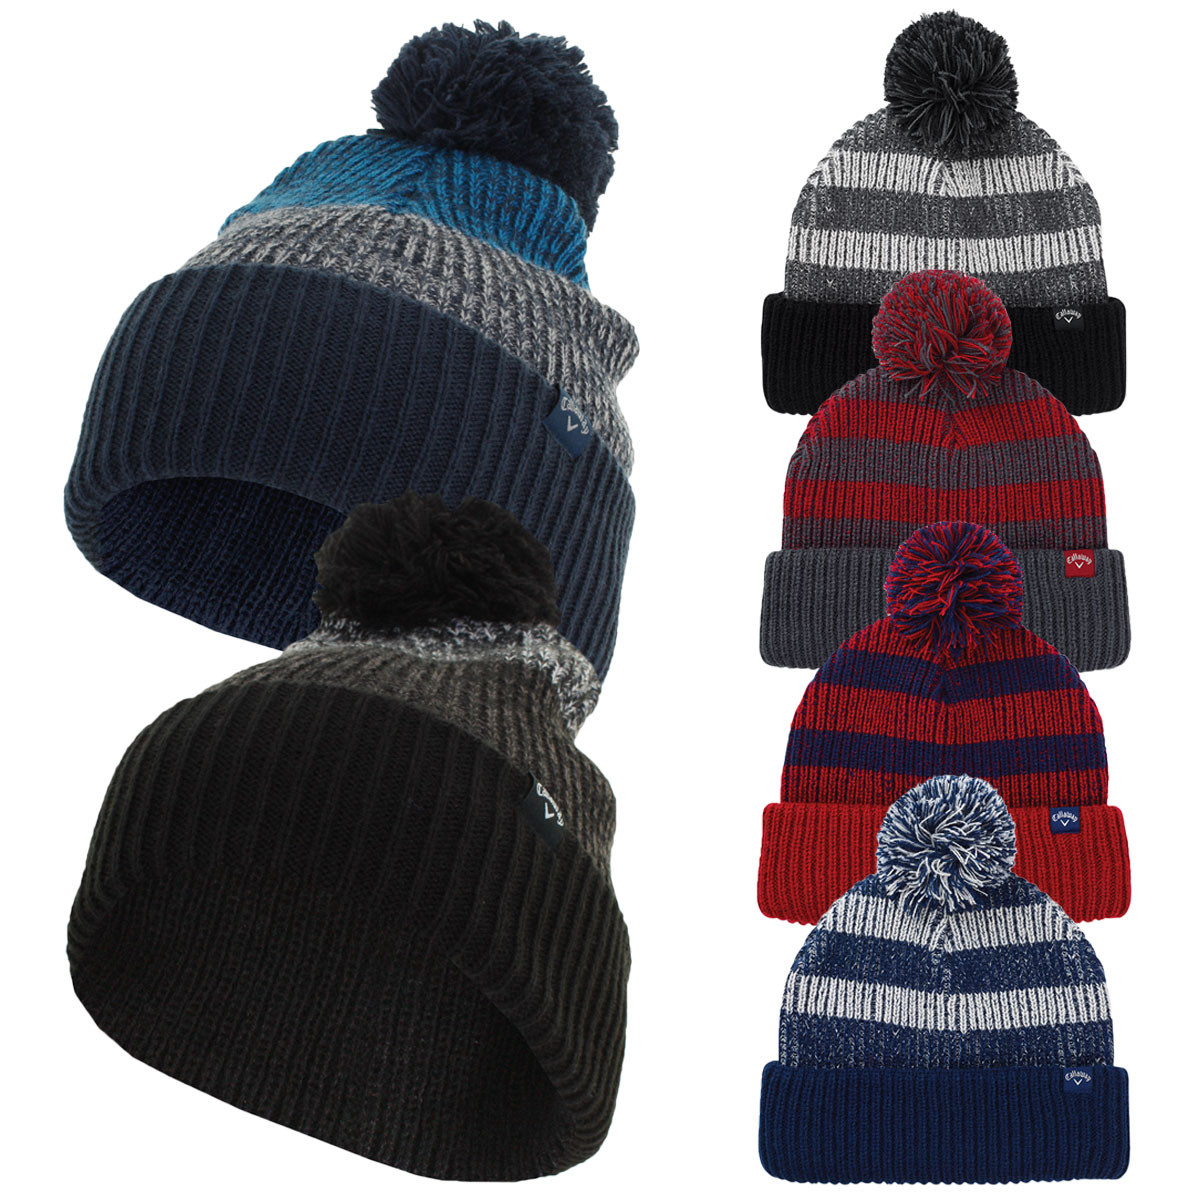 b043e53f926 Callaway Golf 2019 Pom Pom Knitted Extra Warmth Beanie Bobble Hat ...